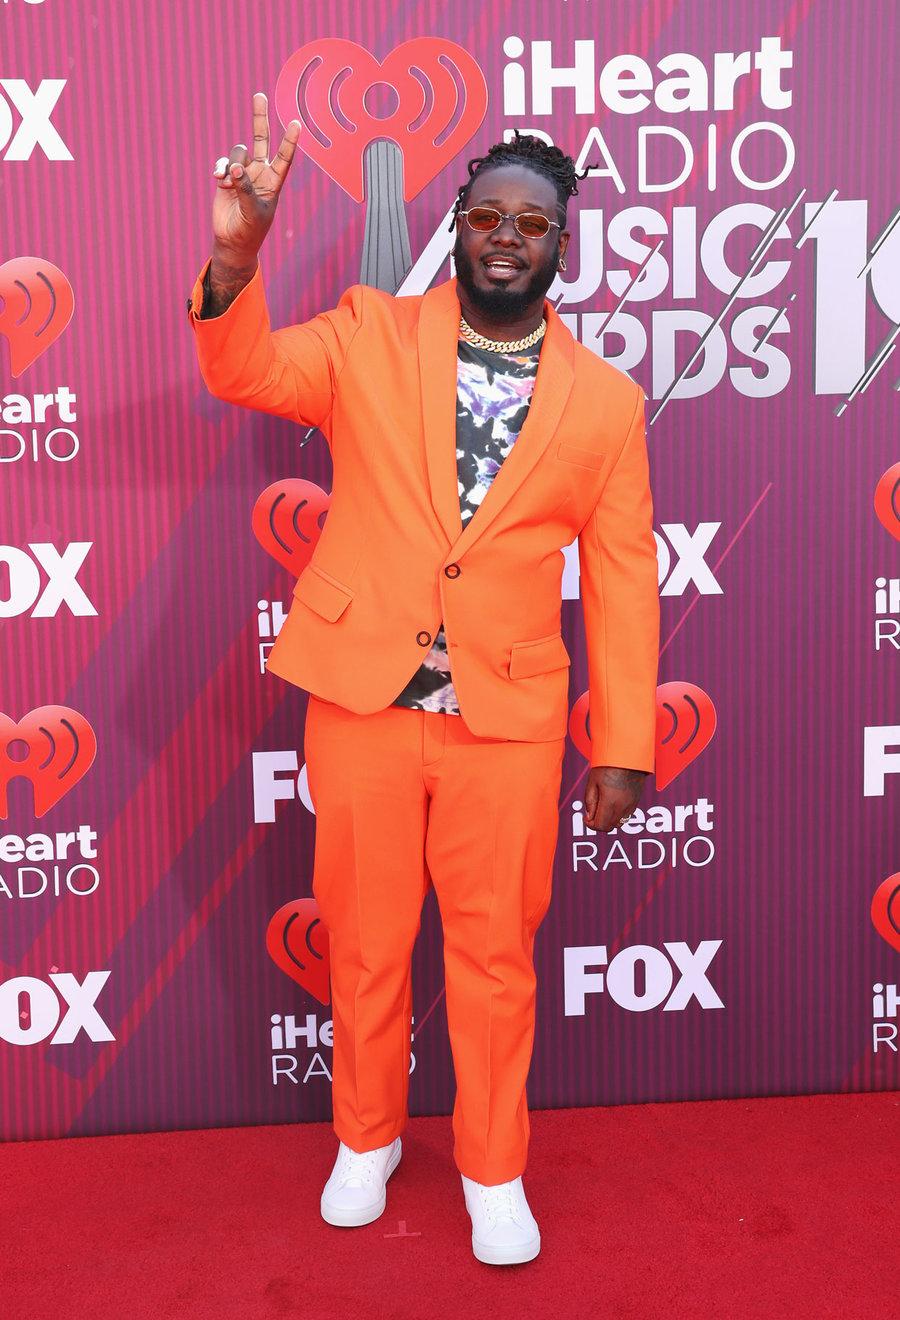 iHeartRadio Music Awards 2019: Highlights & Winners - Music